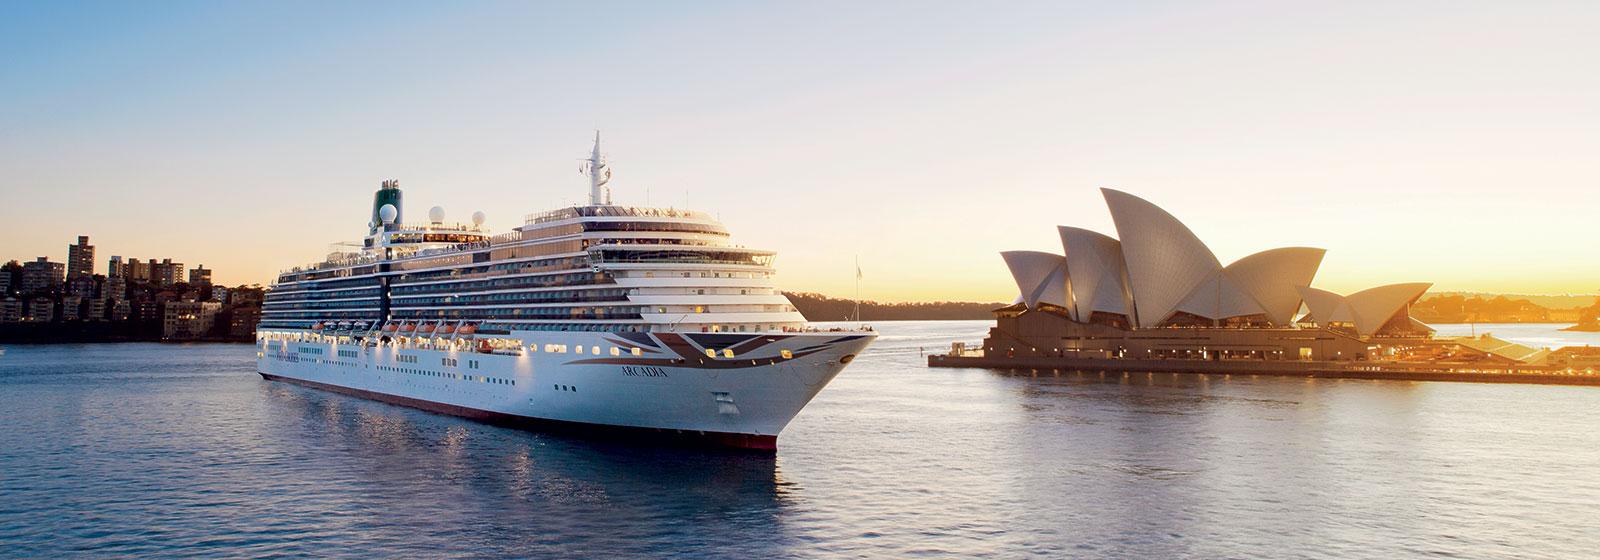 Arcadia in Sydney